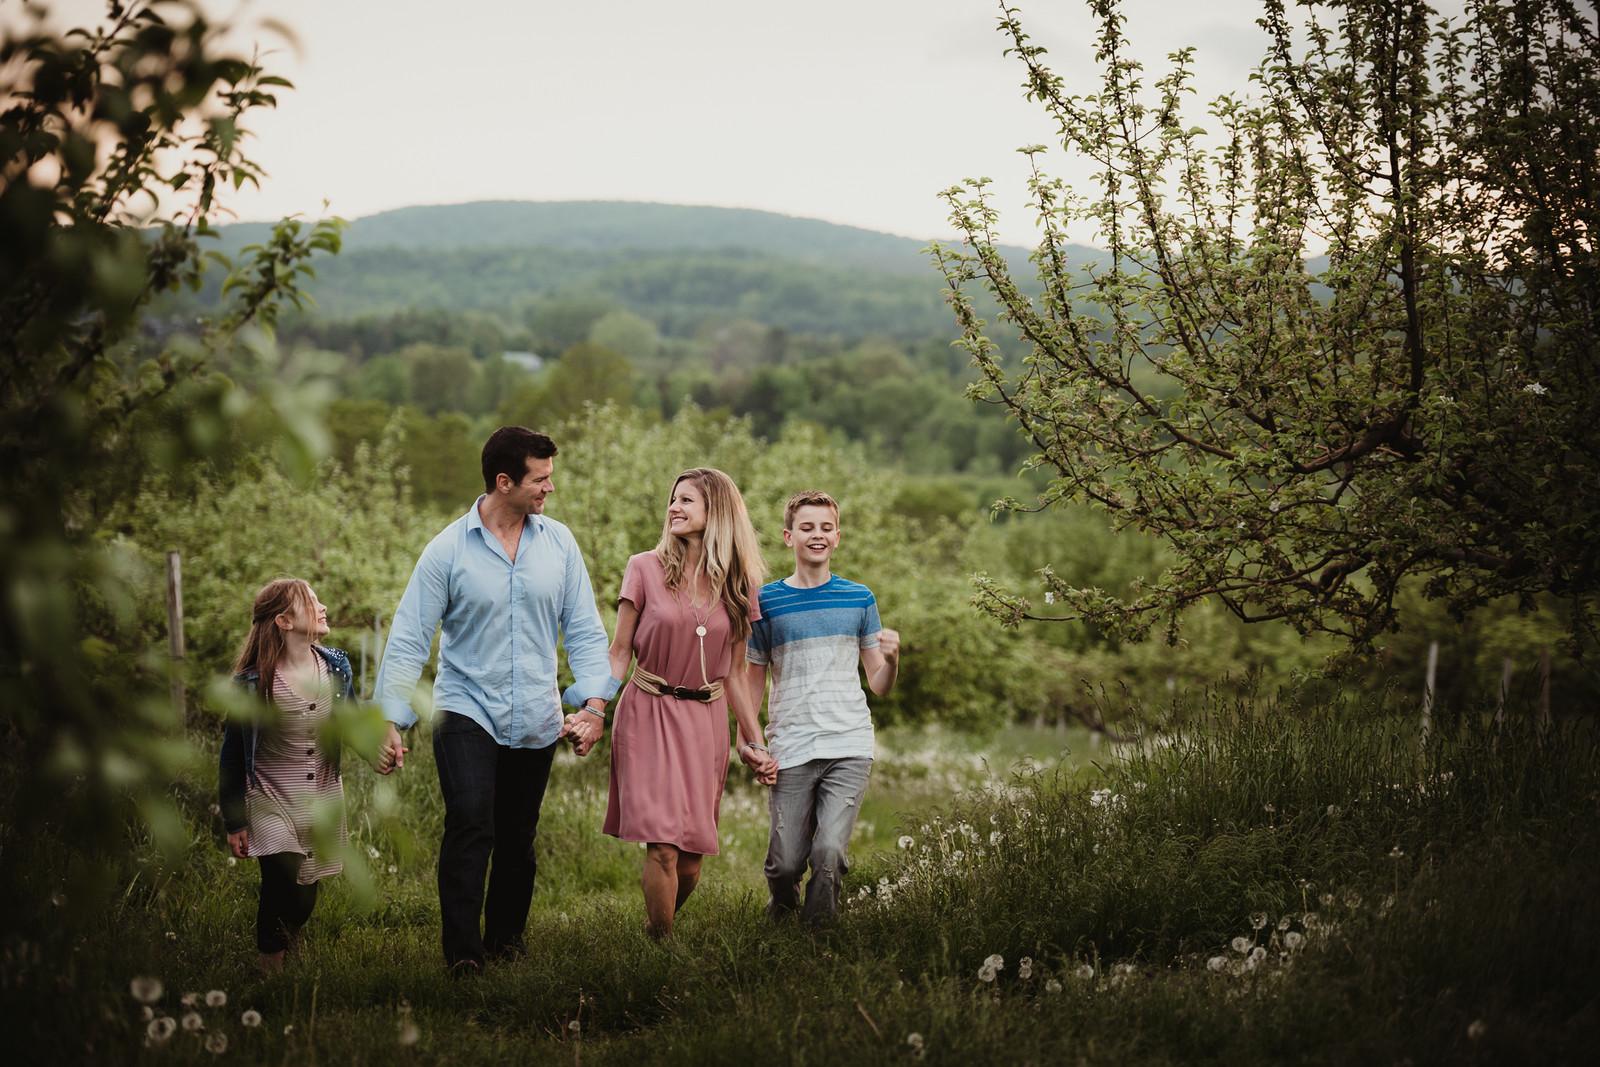 Family Photographer Rochester, NY | Danielle Snow Photography